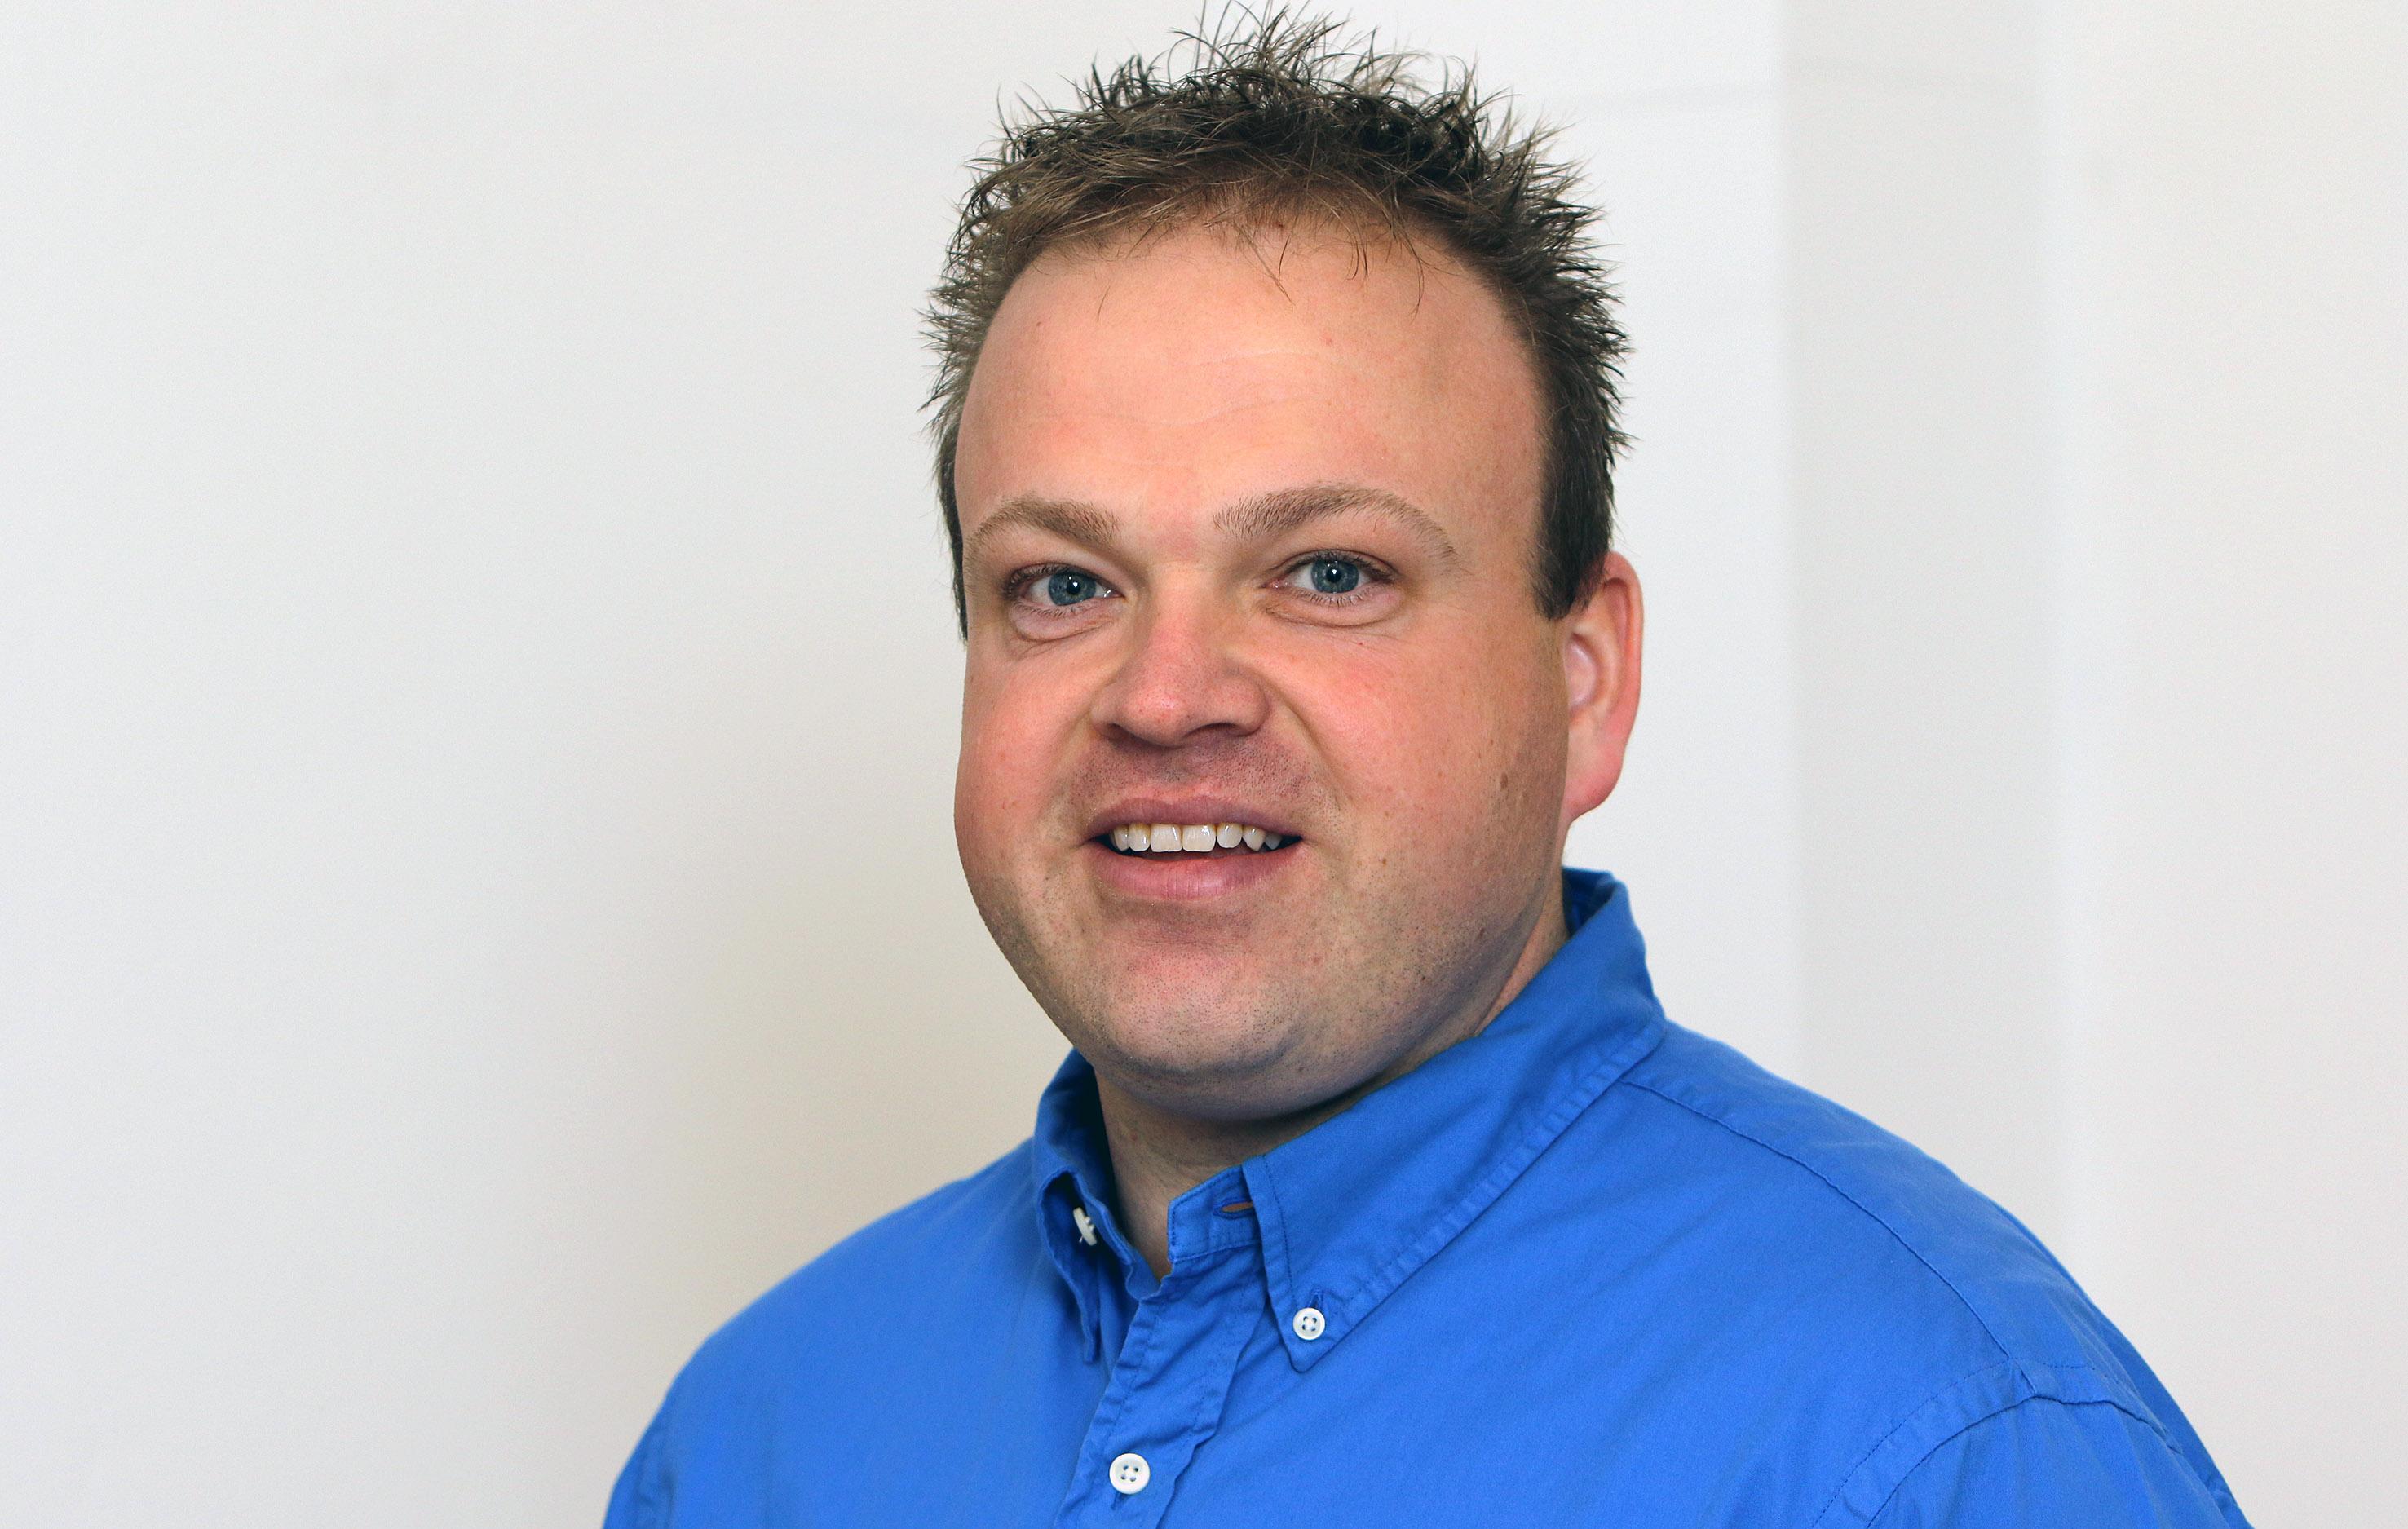 Christian Scholüke